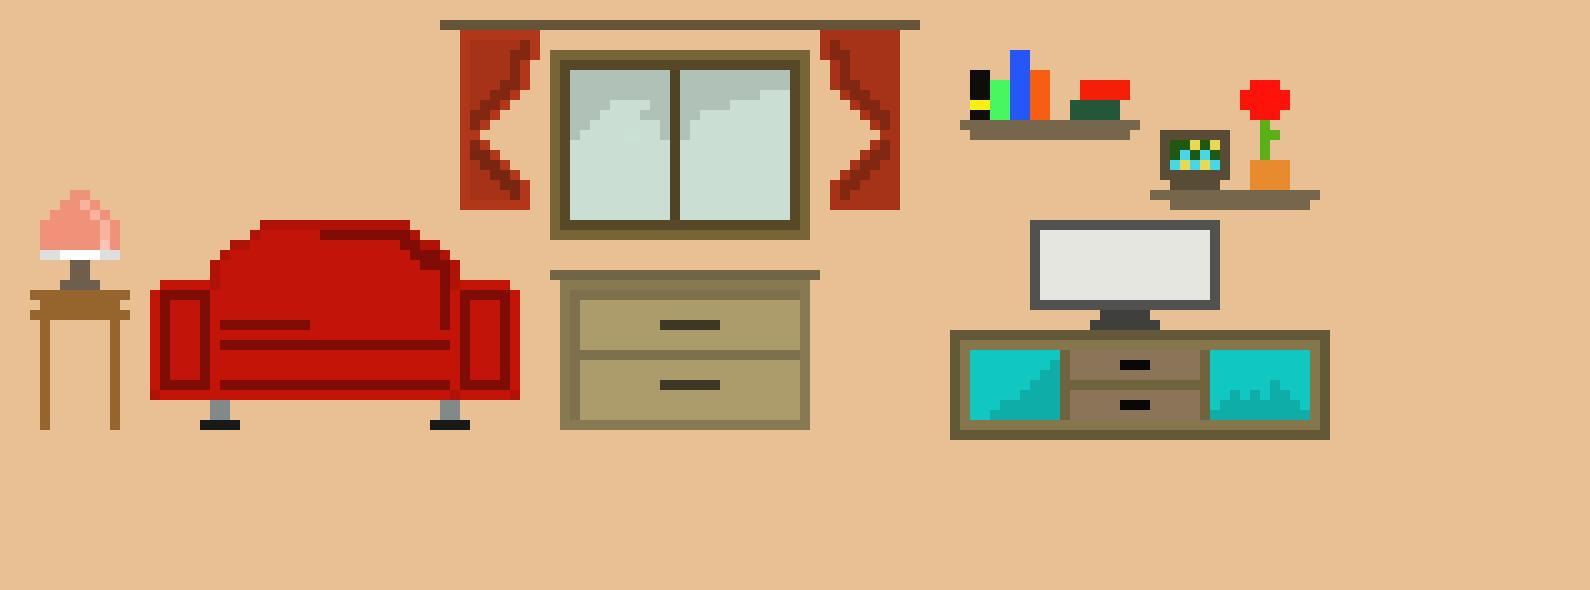 living room pixel art maker